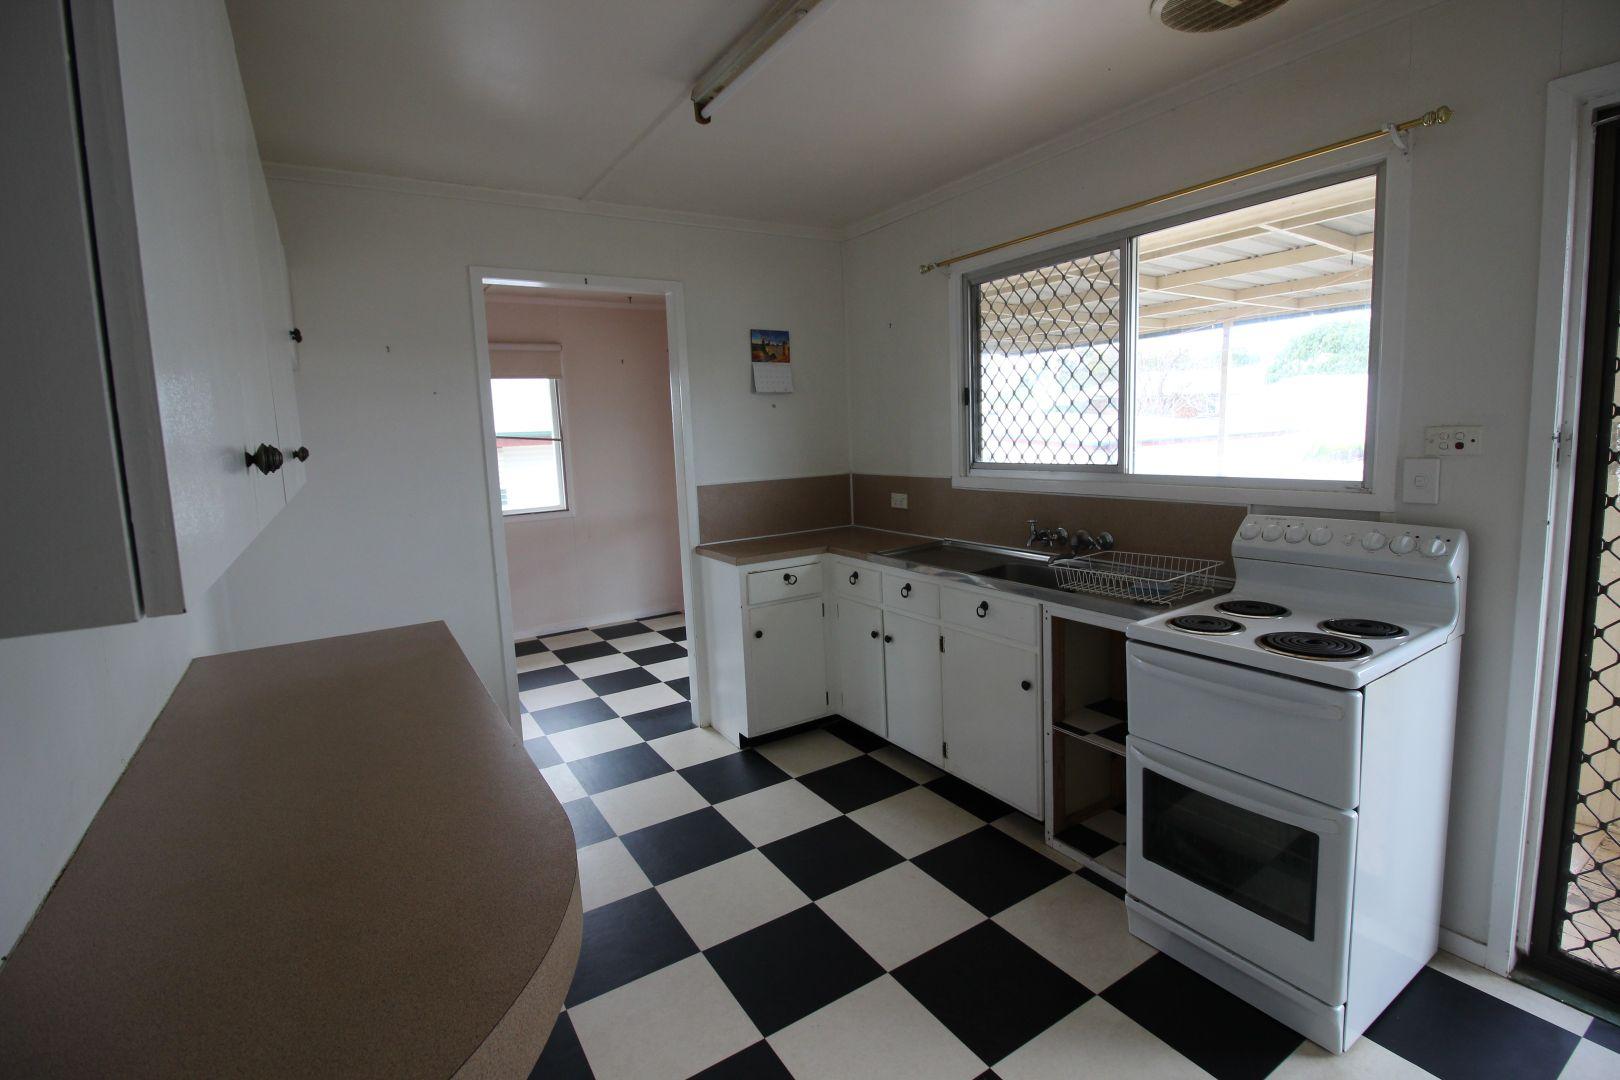 83 Fielding St, Gayndah QLD 4625, Image 1